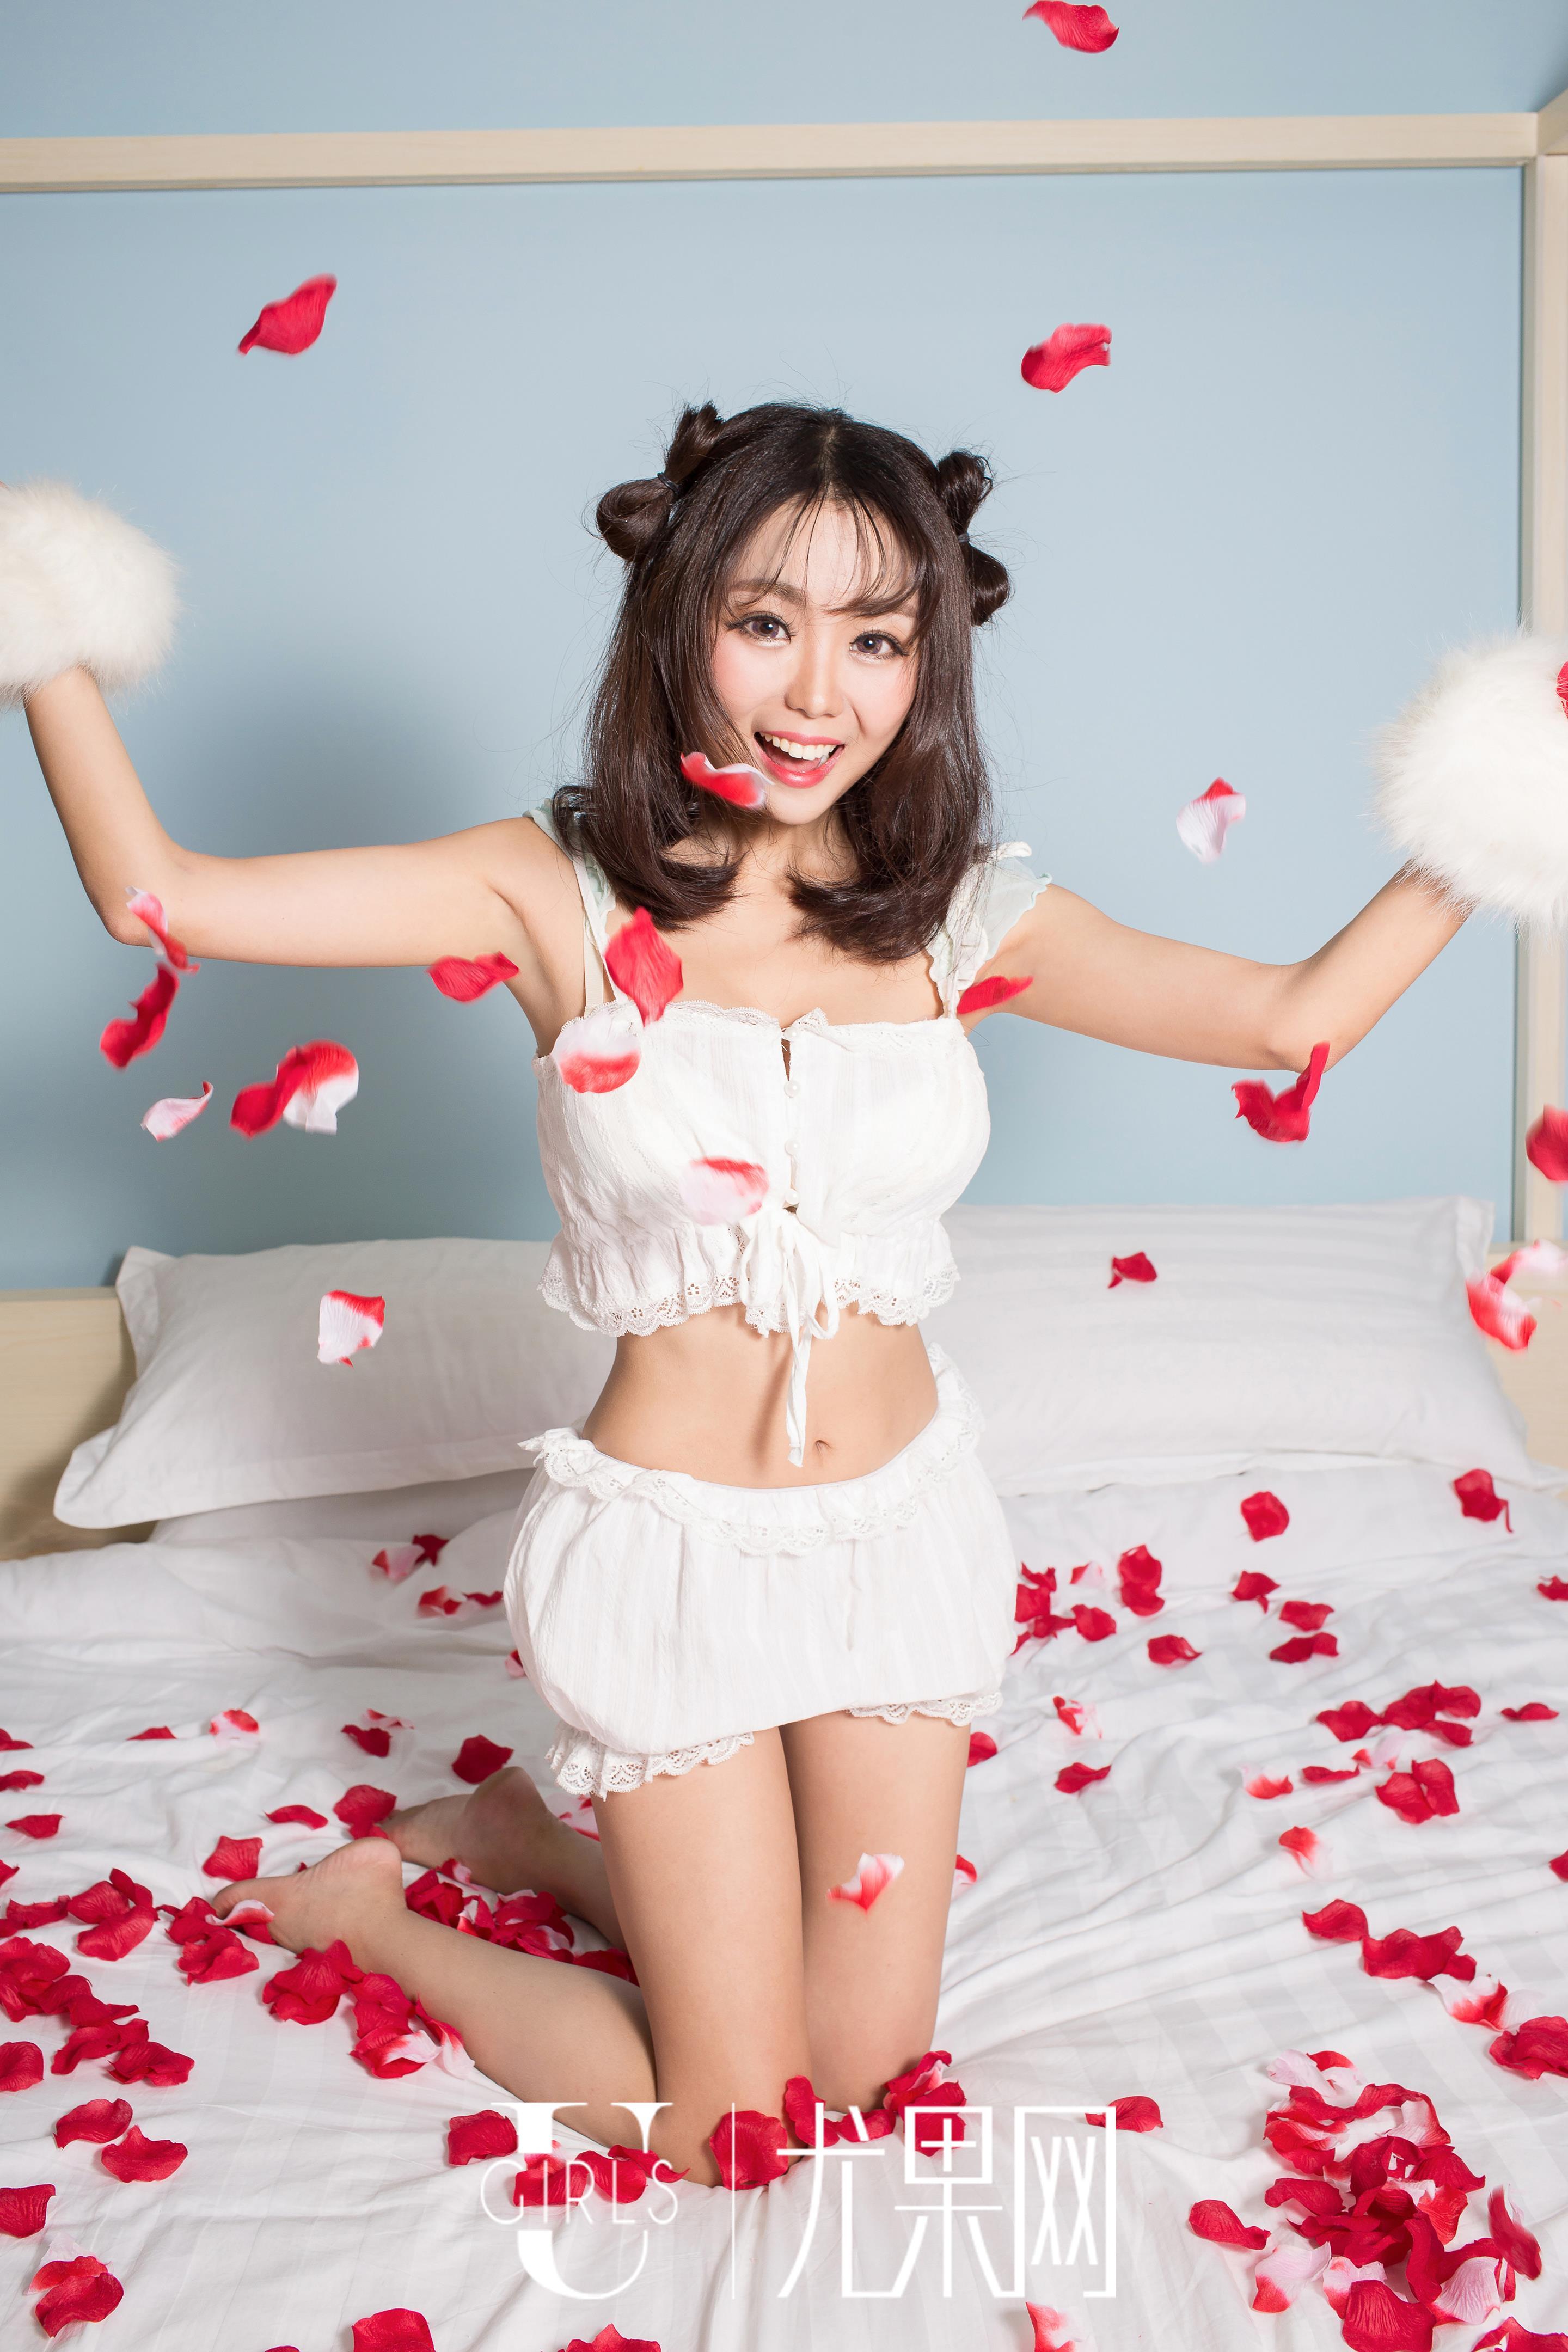 [Ugirls尤果网]U185 空灵惑 白色蕾丝情趣内衣与白色网袜美腿性感私房写真集